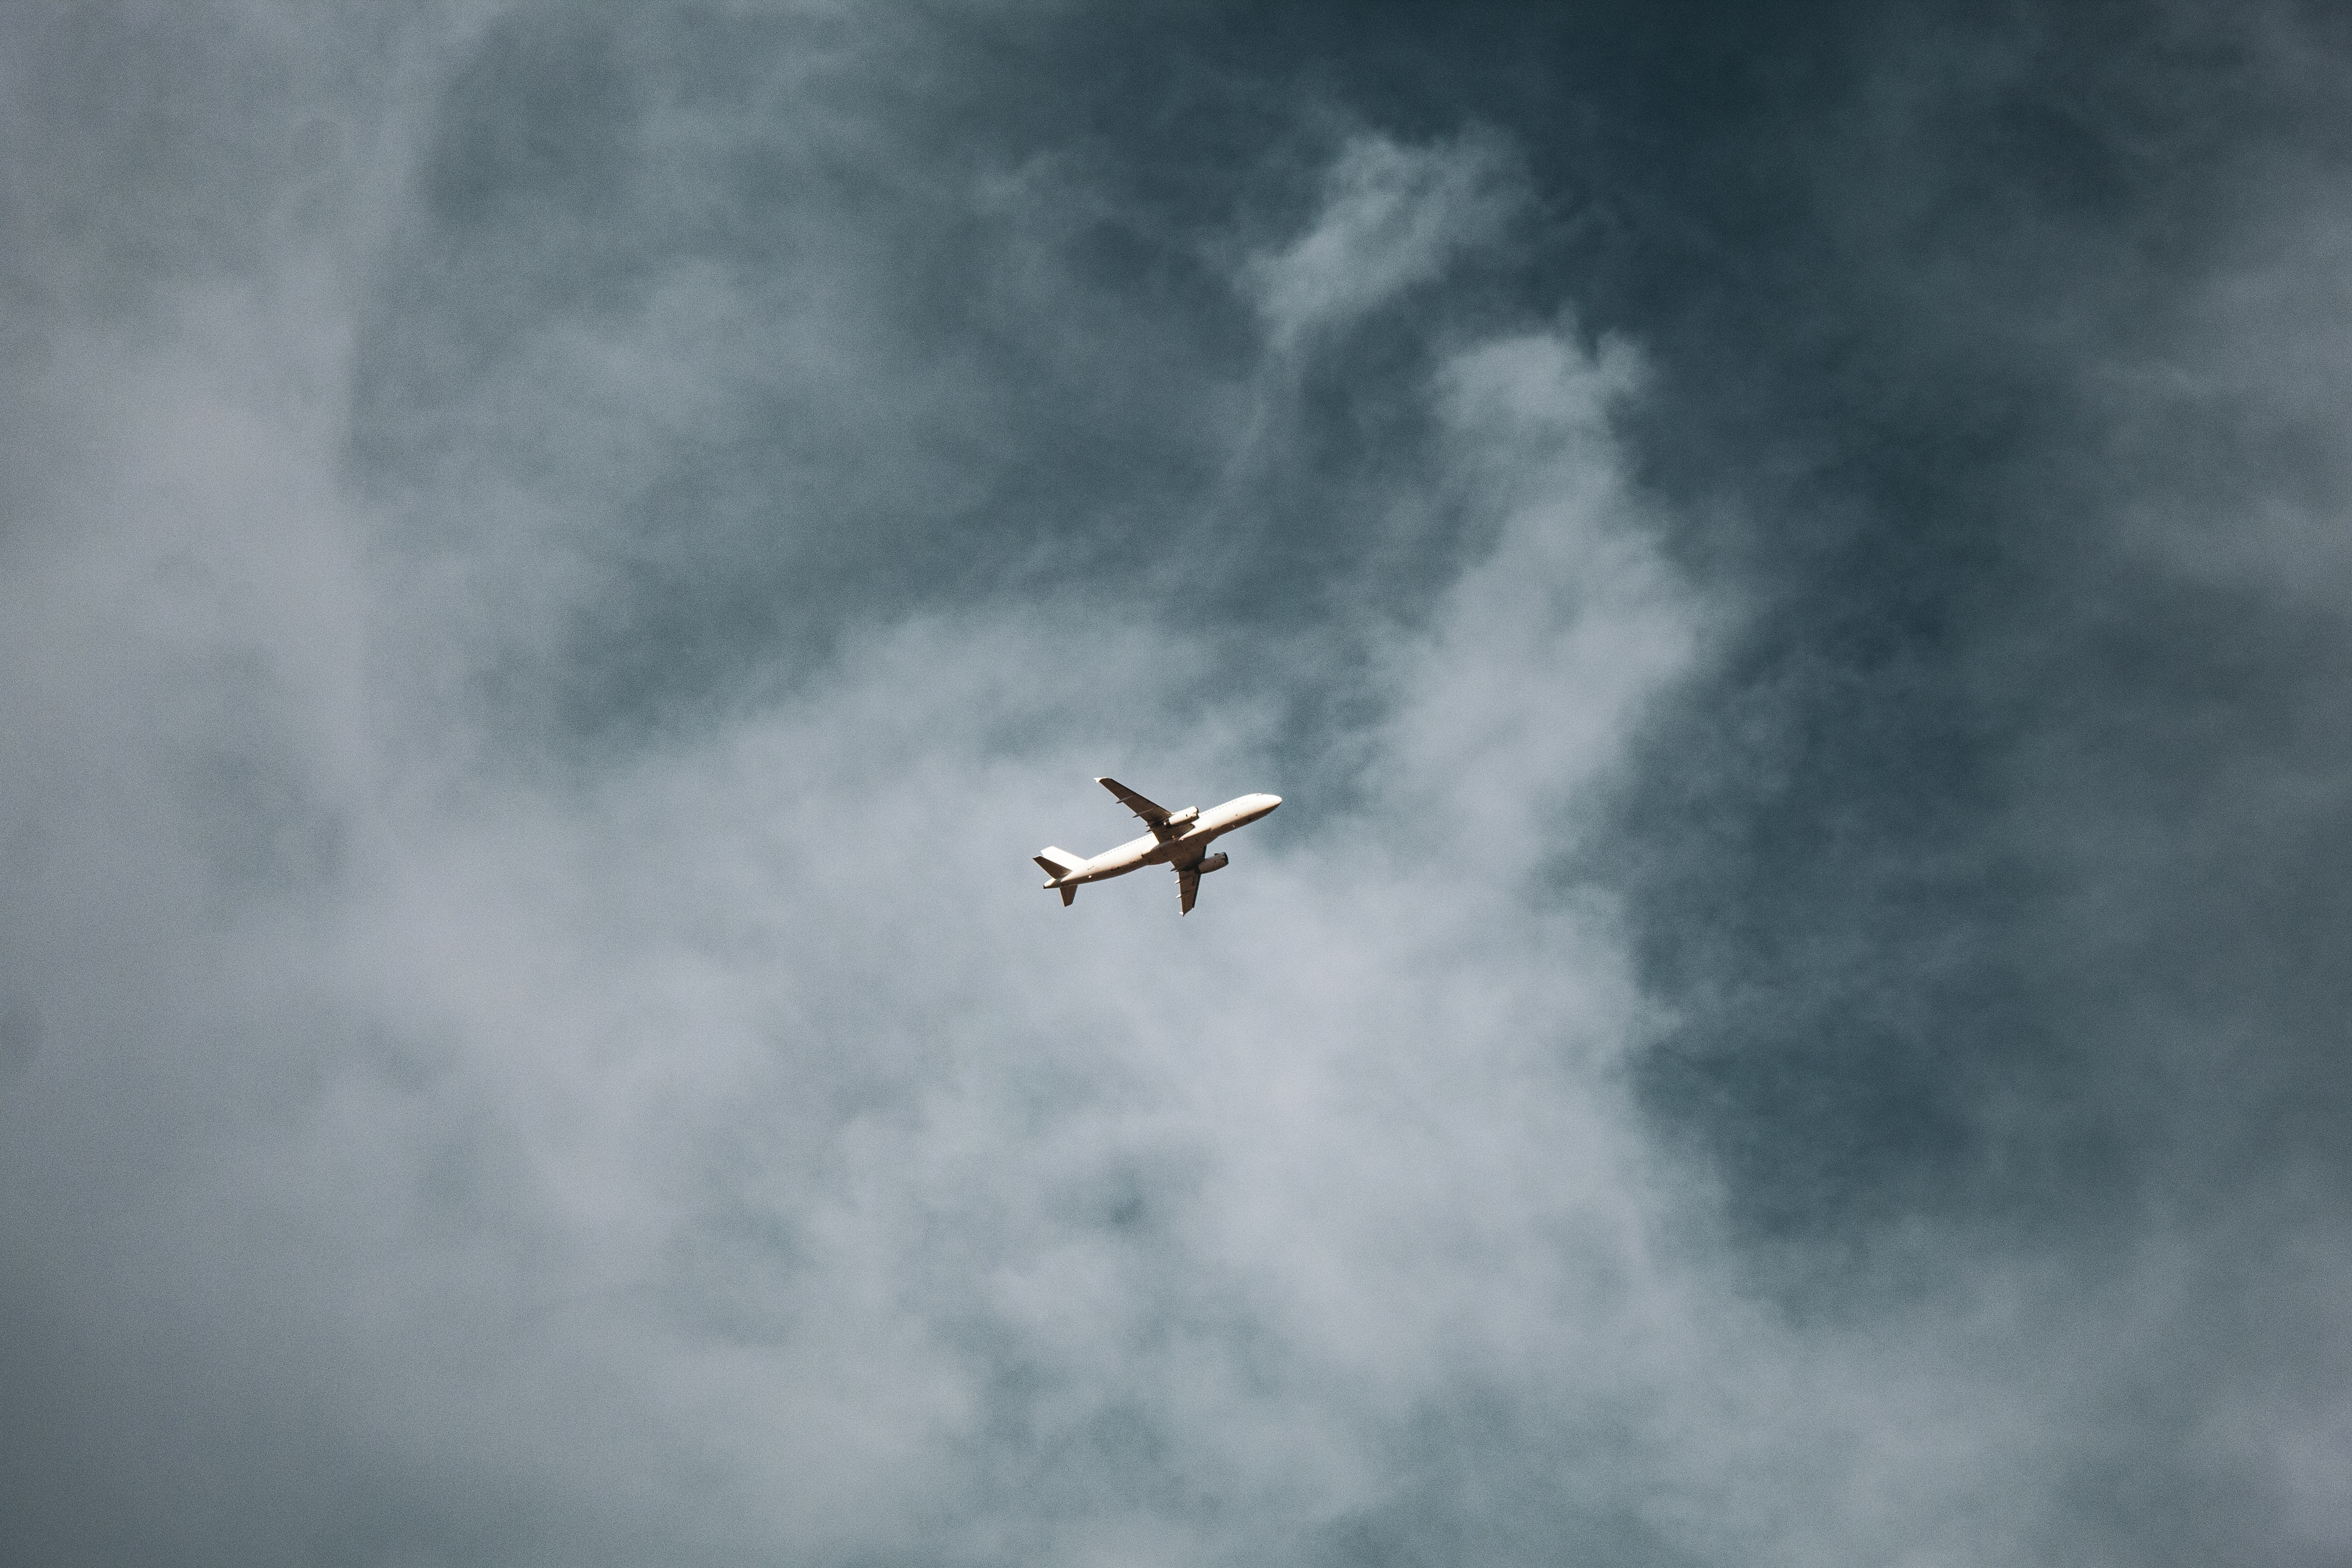 A white plane on air under a cloudy sky